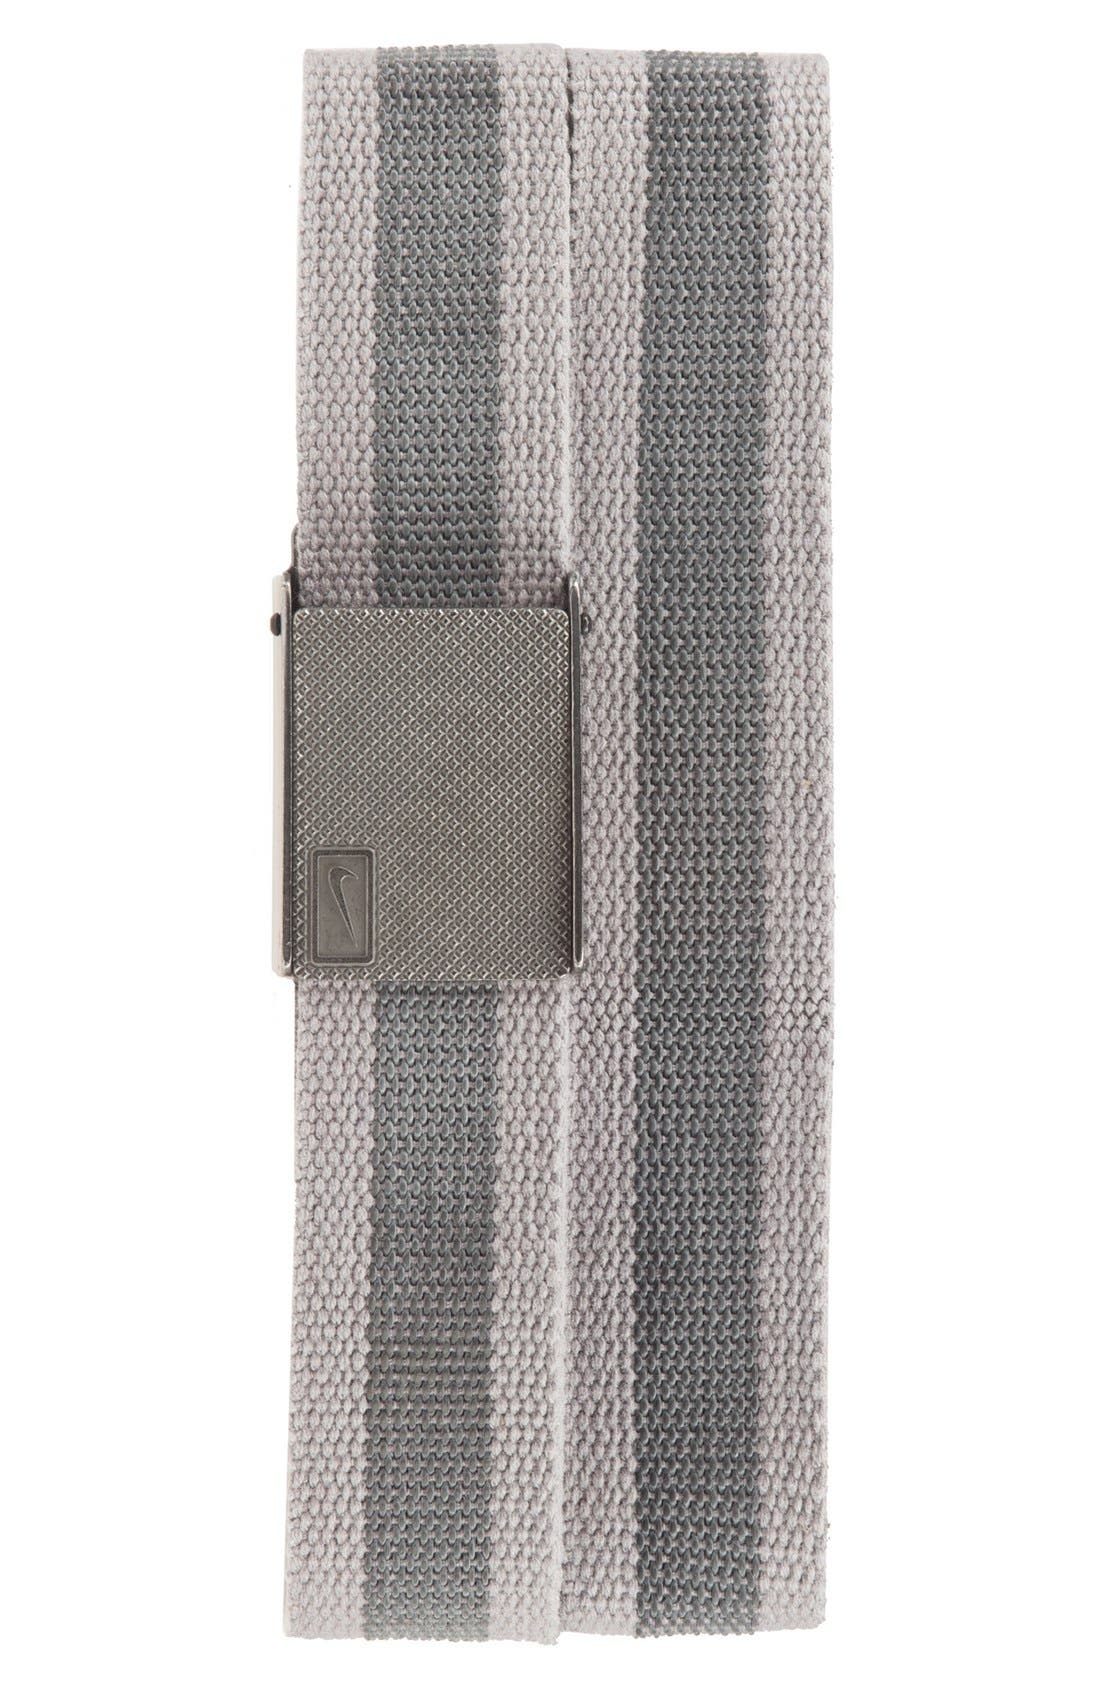 Main Image - Nike Reversible Web Belt